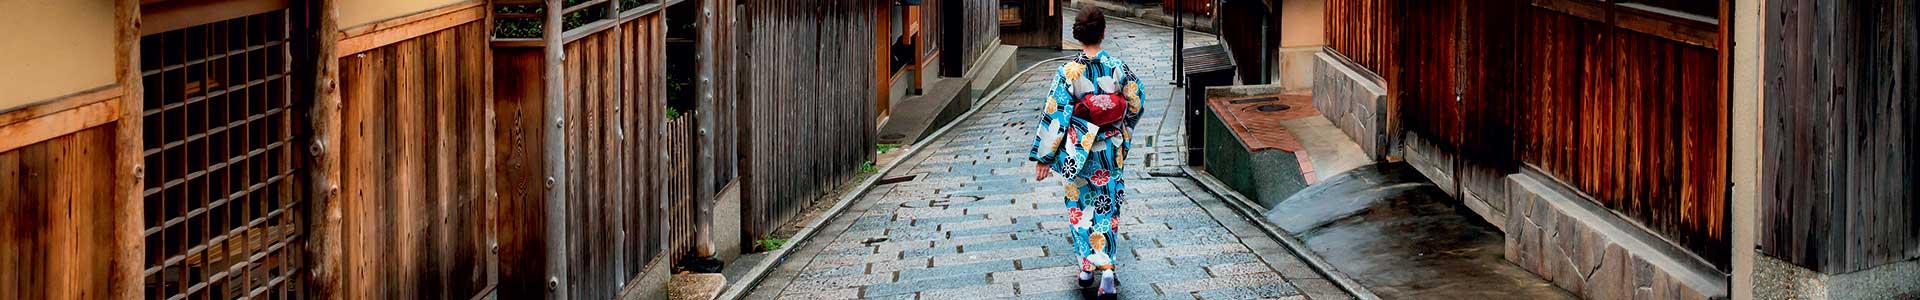 Voyage au Japon - TUI